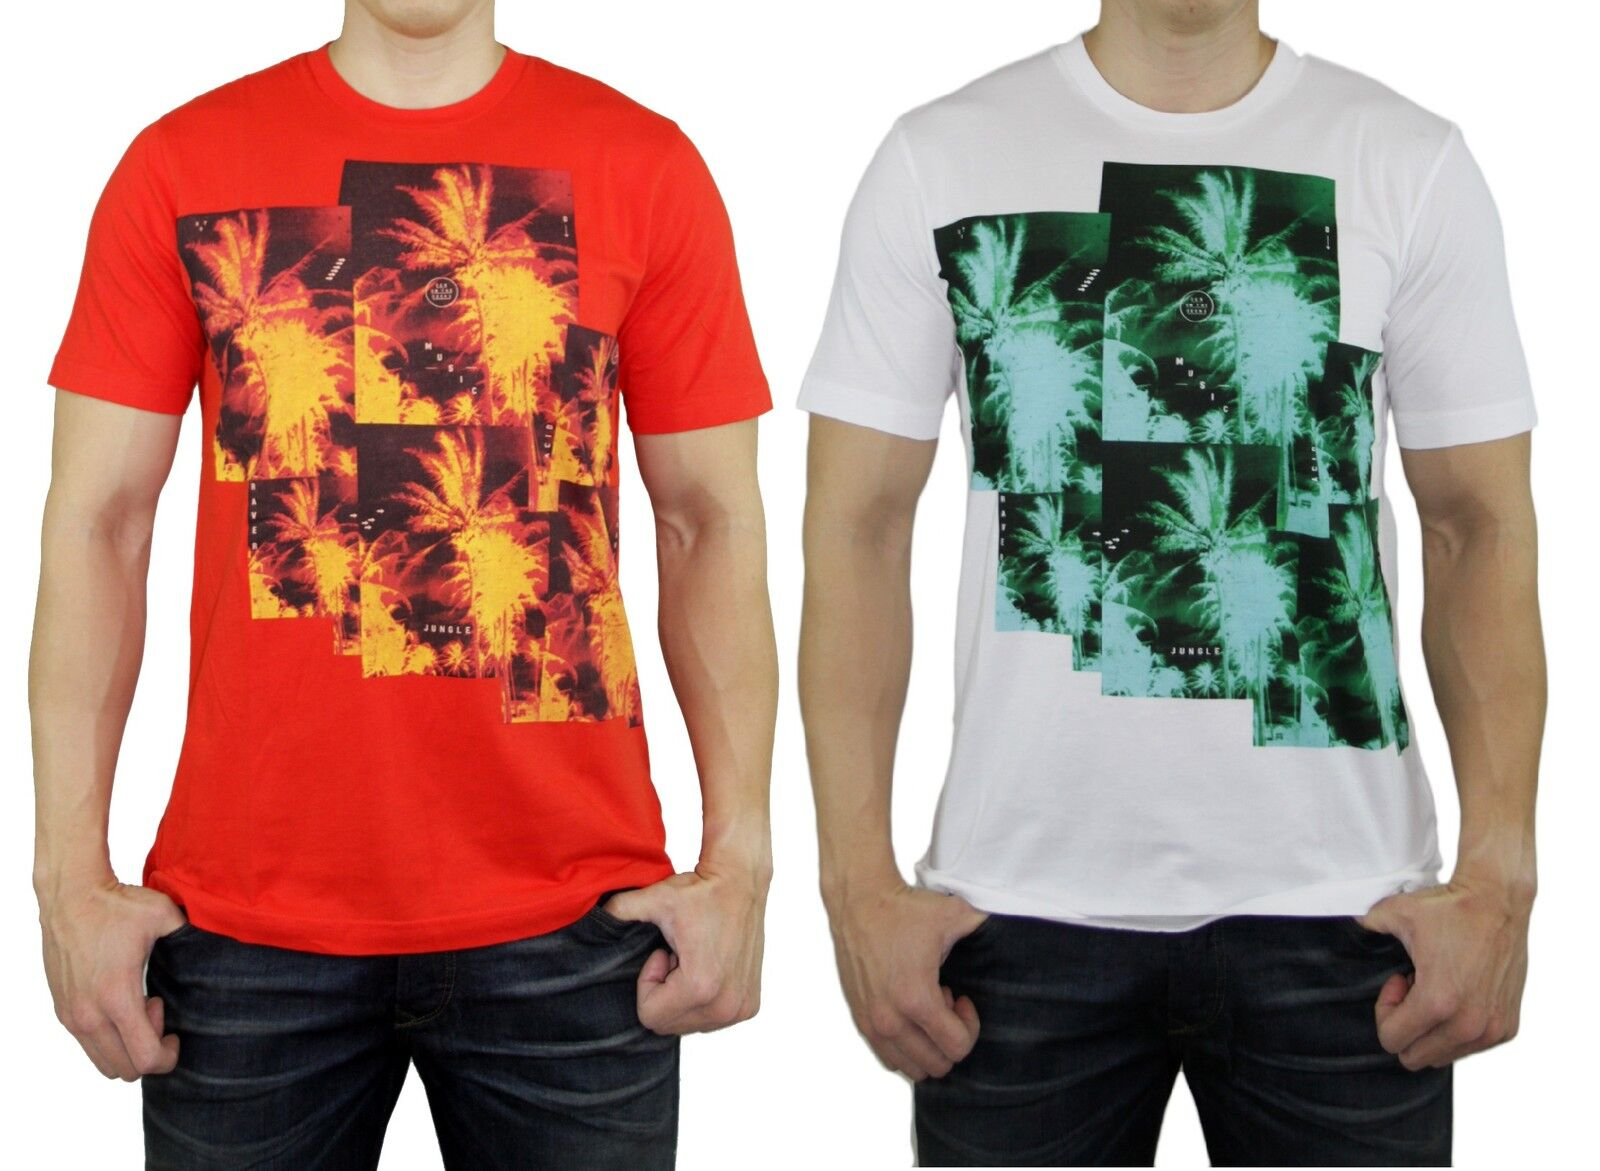 DIESEL Brand Mens T-PIR Logo Fireworks SS Vintage Tee T Shirts Top Red White